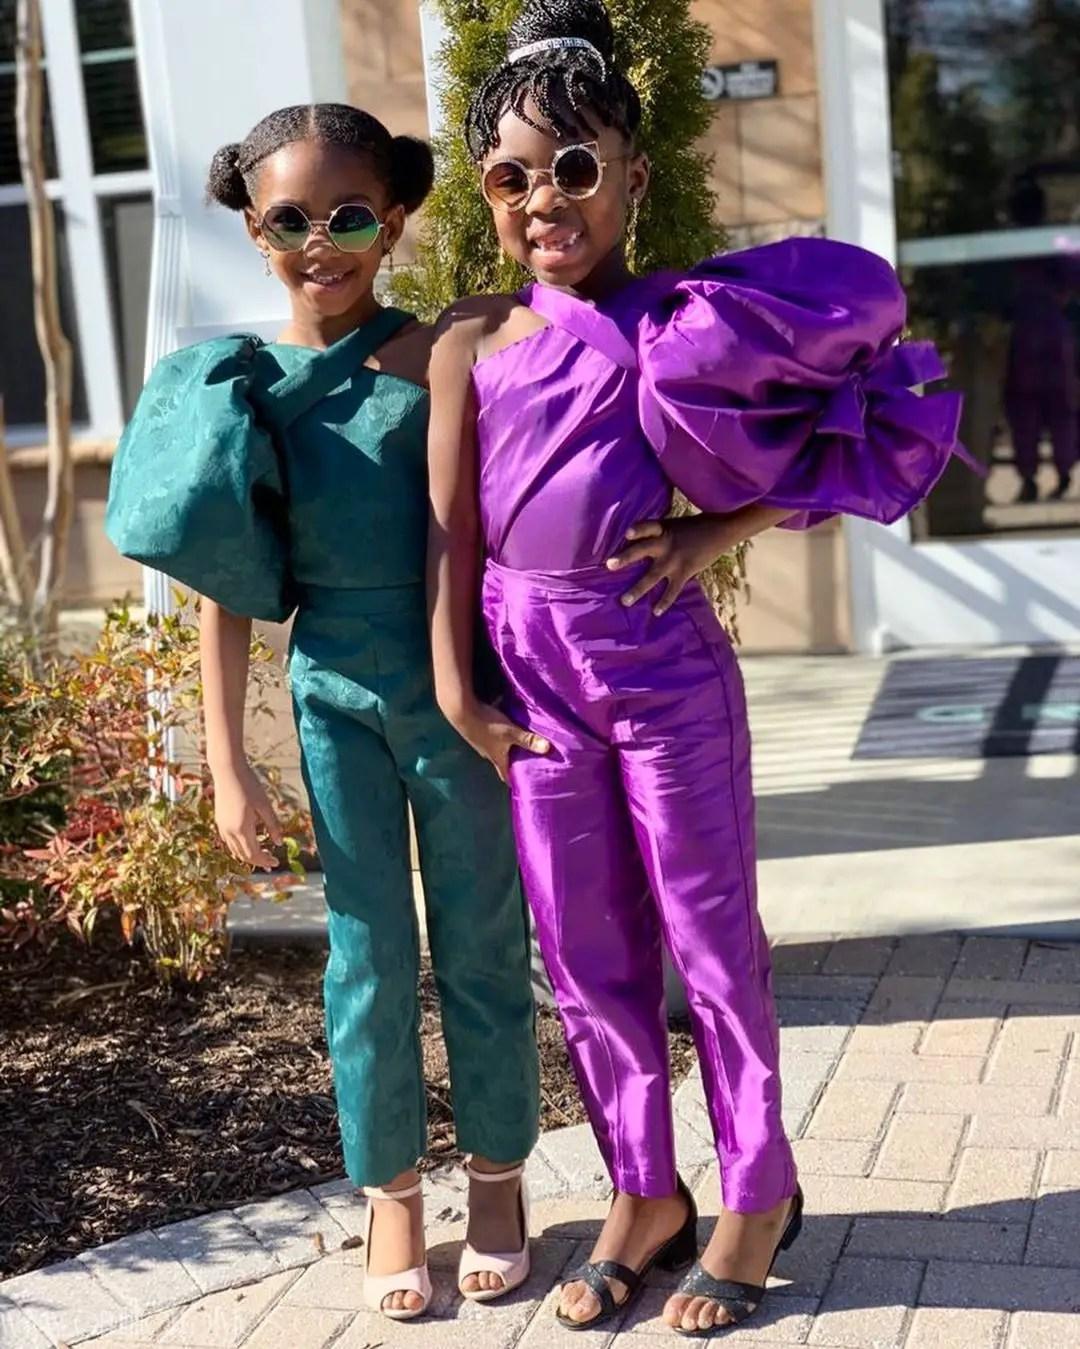 Adorable Girls Recreate Outfits By Lupita Nyong'o And Chimamanda Adichie